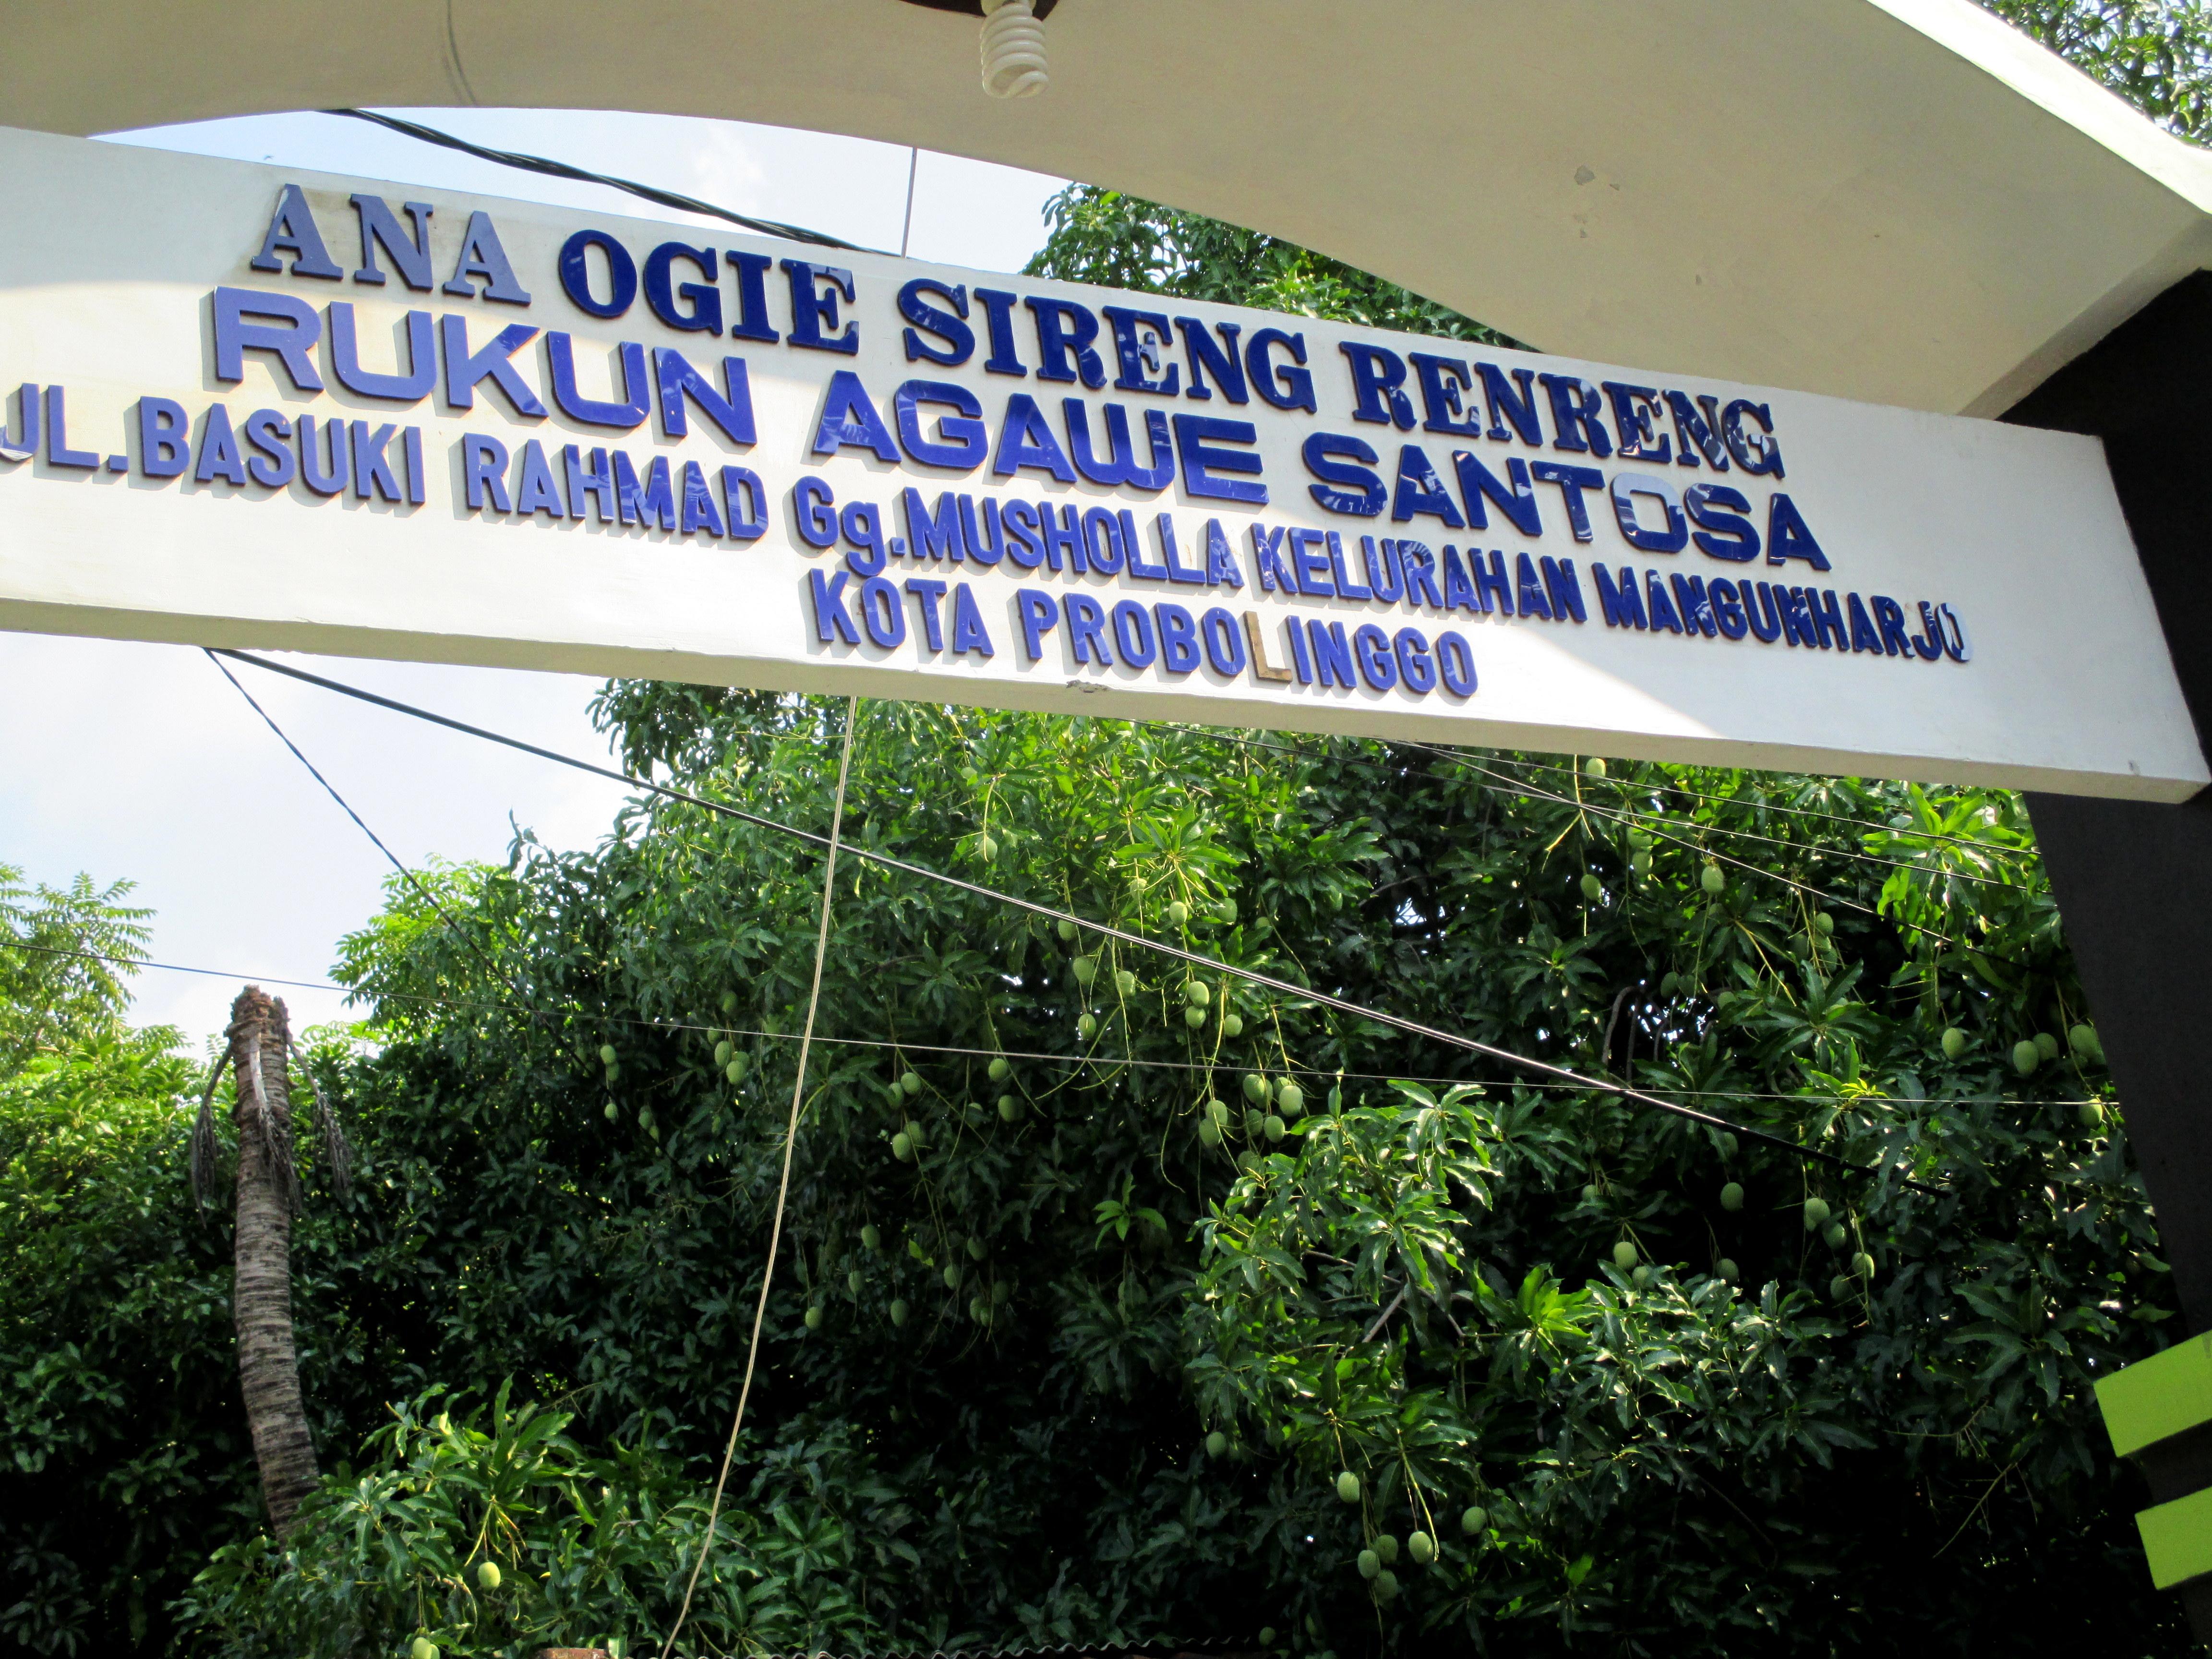 Gapura di salah satu gang kecil di kota Probolinggo